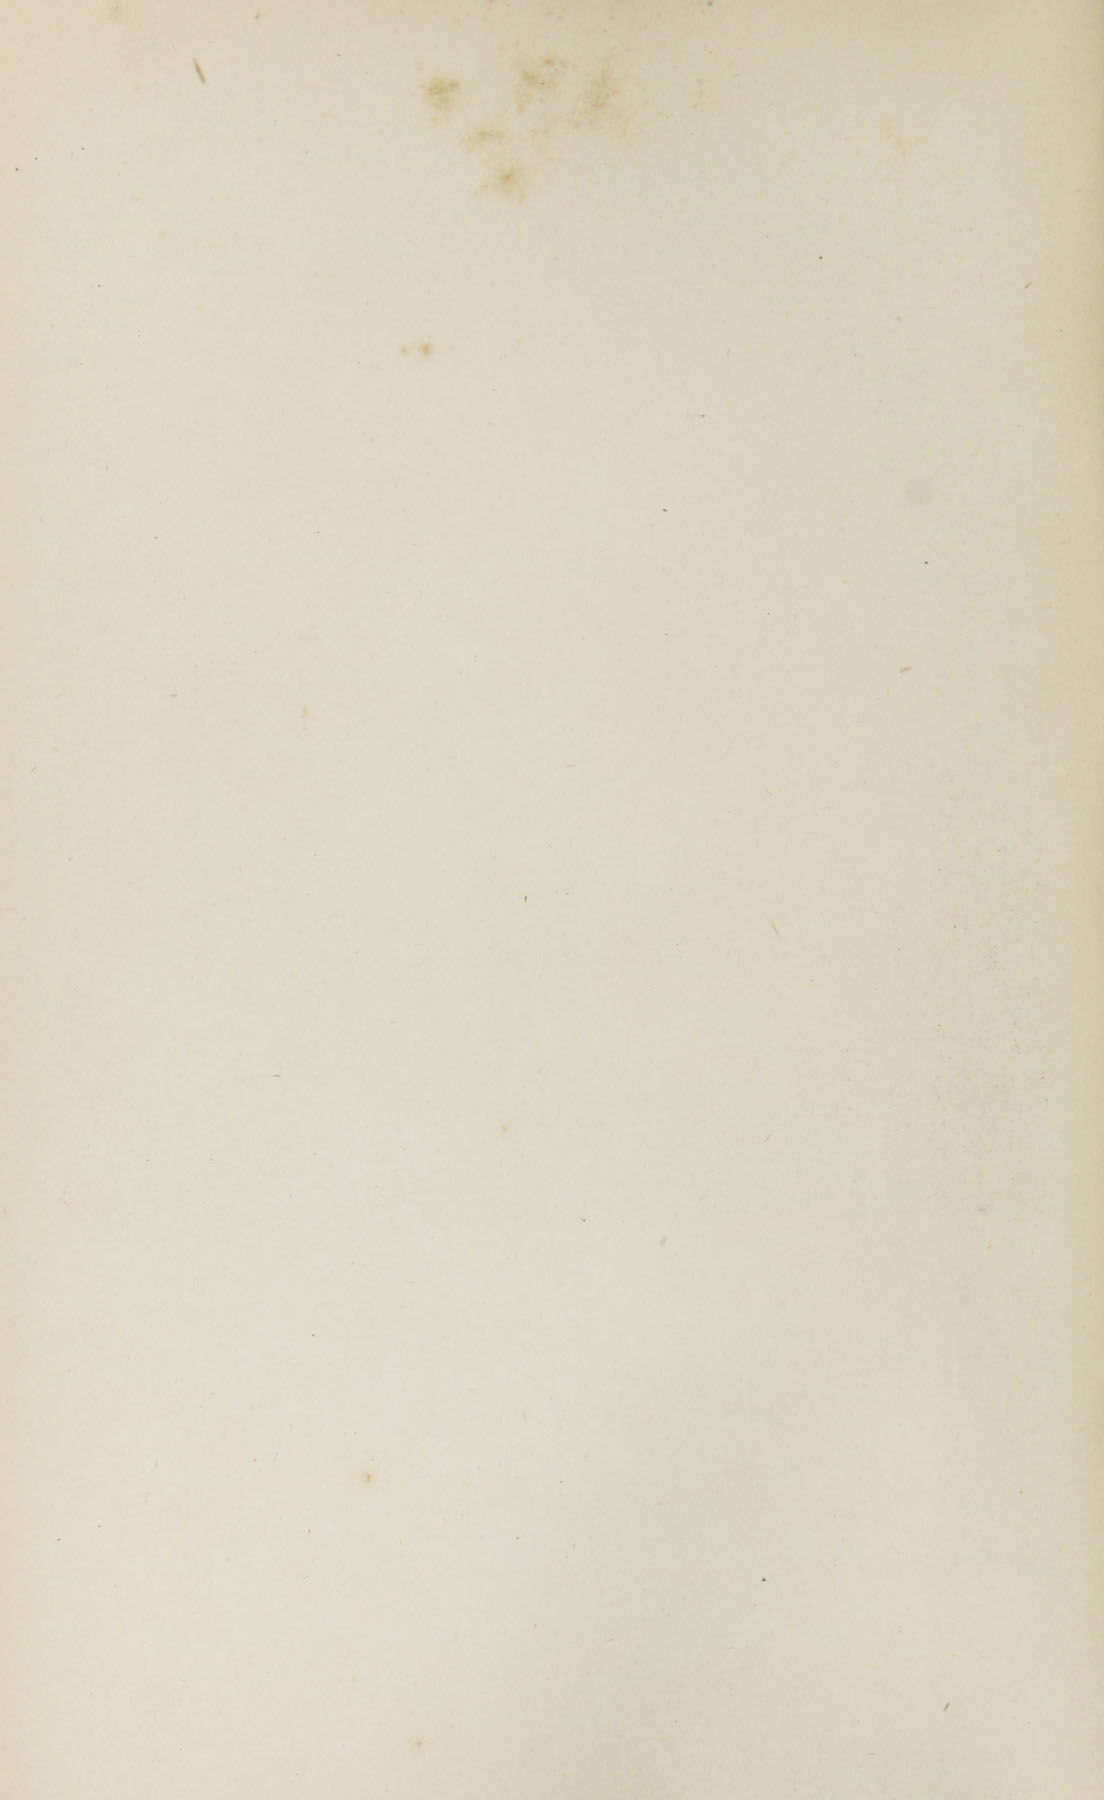 Charleston Yearbook, 1882, page ii